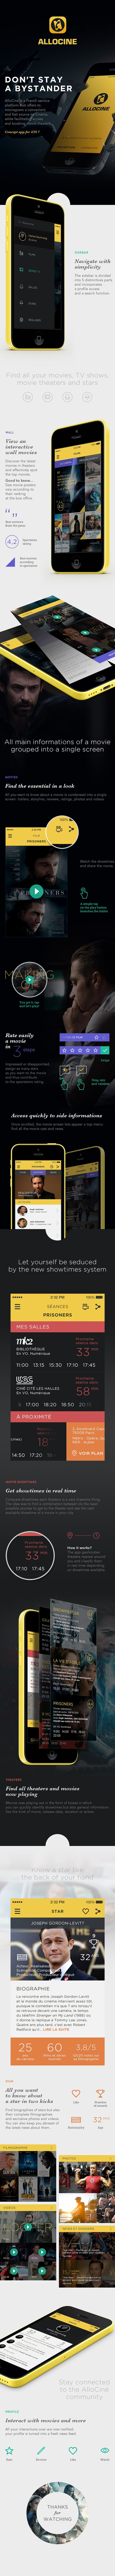 AlloCine - Concept Mobile app on Behance